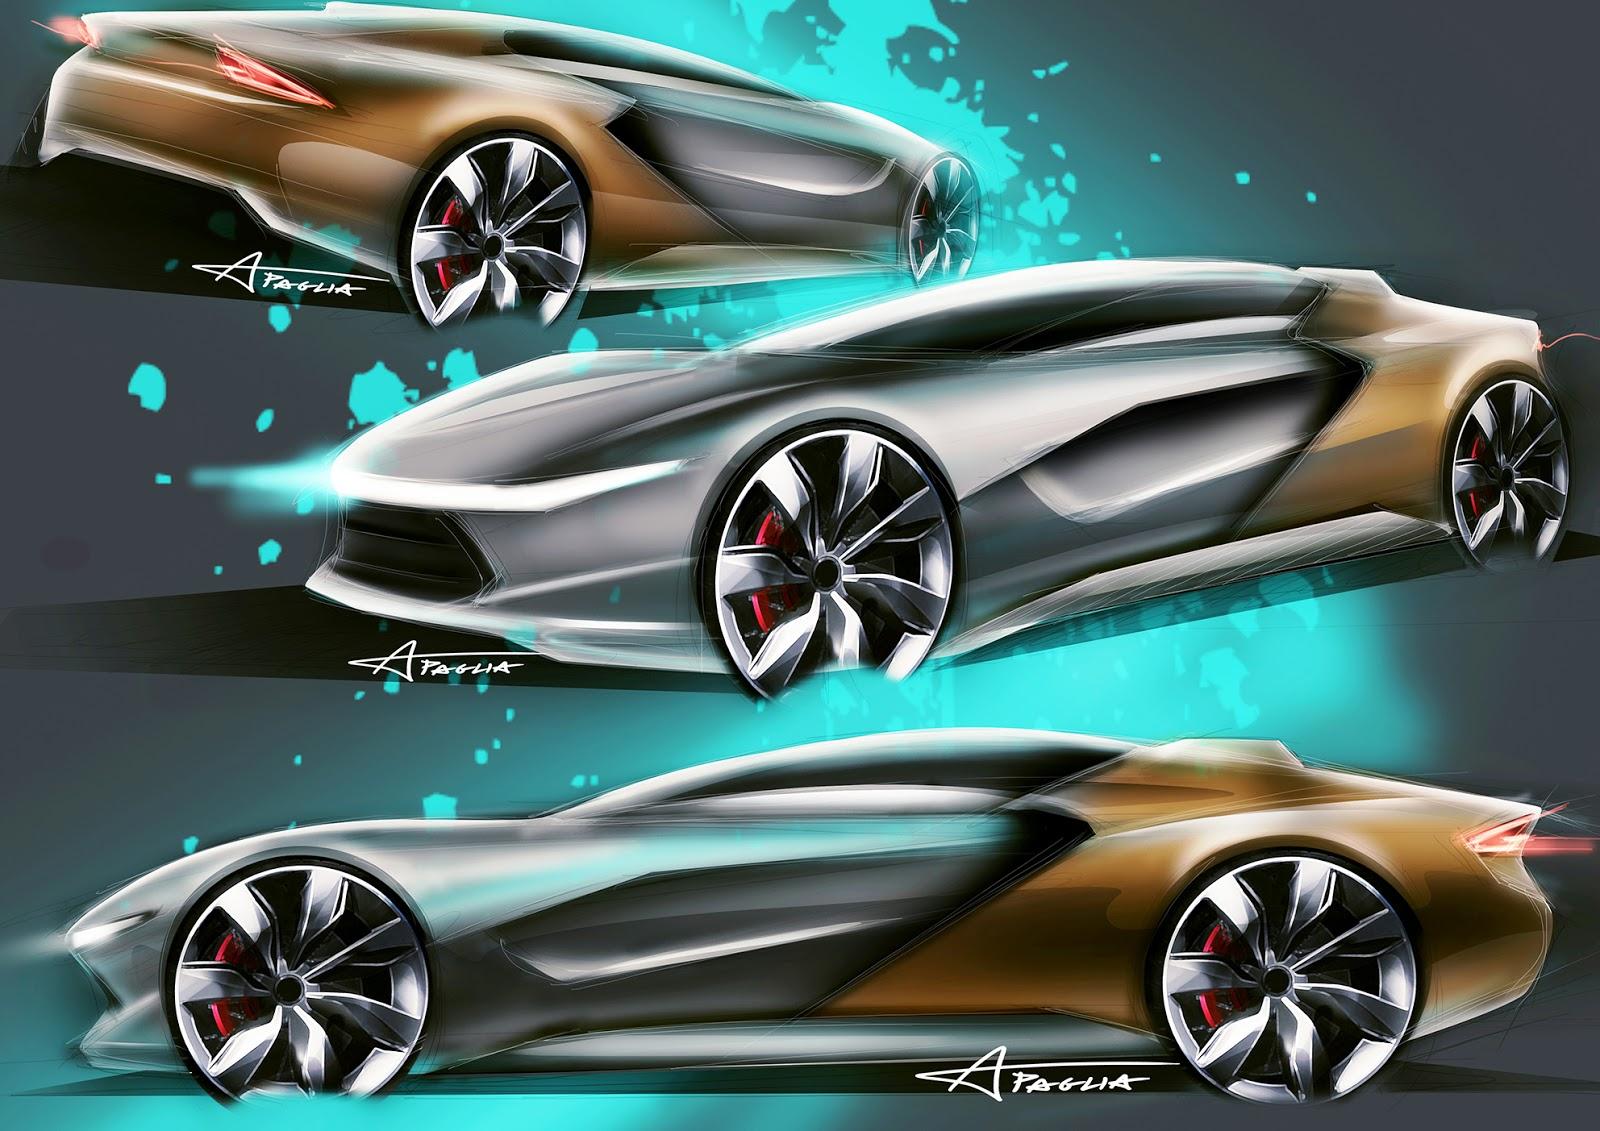 Ap Design Concept Car Sketch